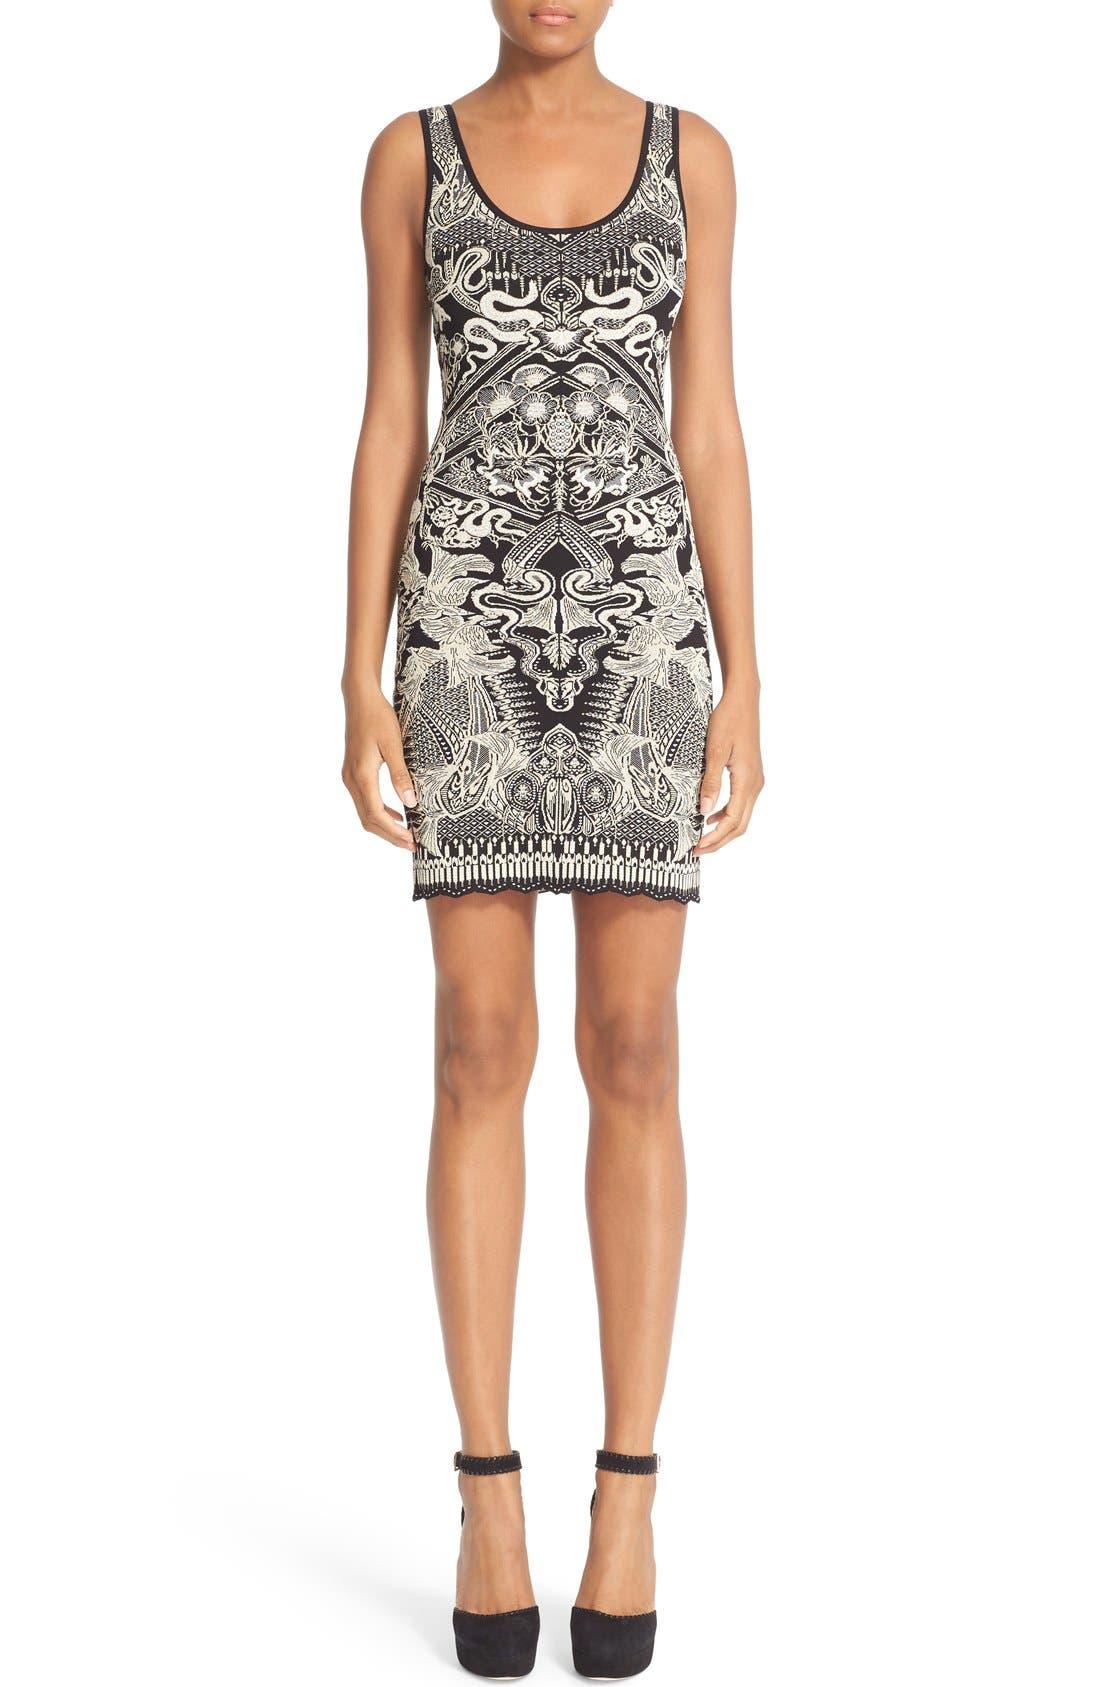 Alternate Image 1 Selected - Roberto Cavalli Jacquard Knit Dress